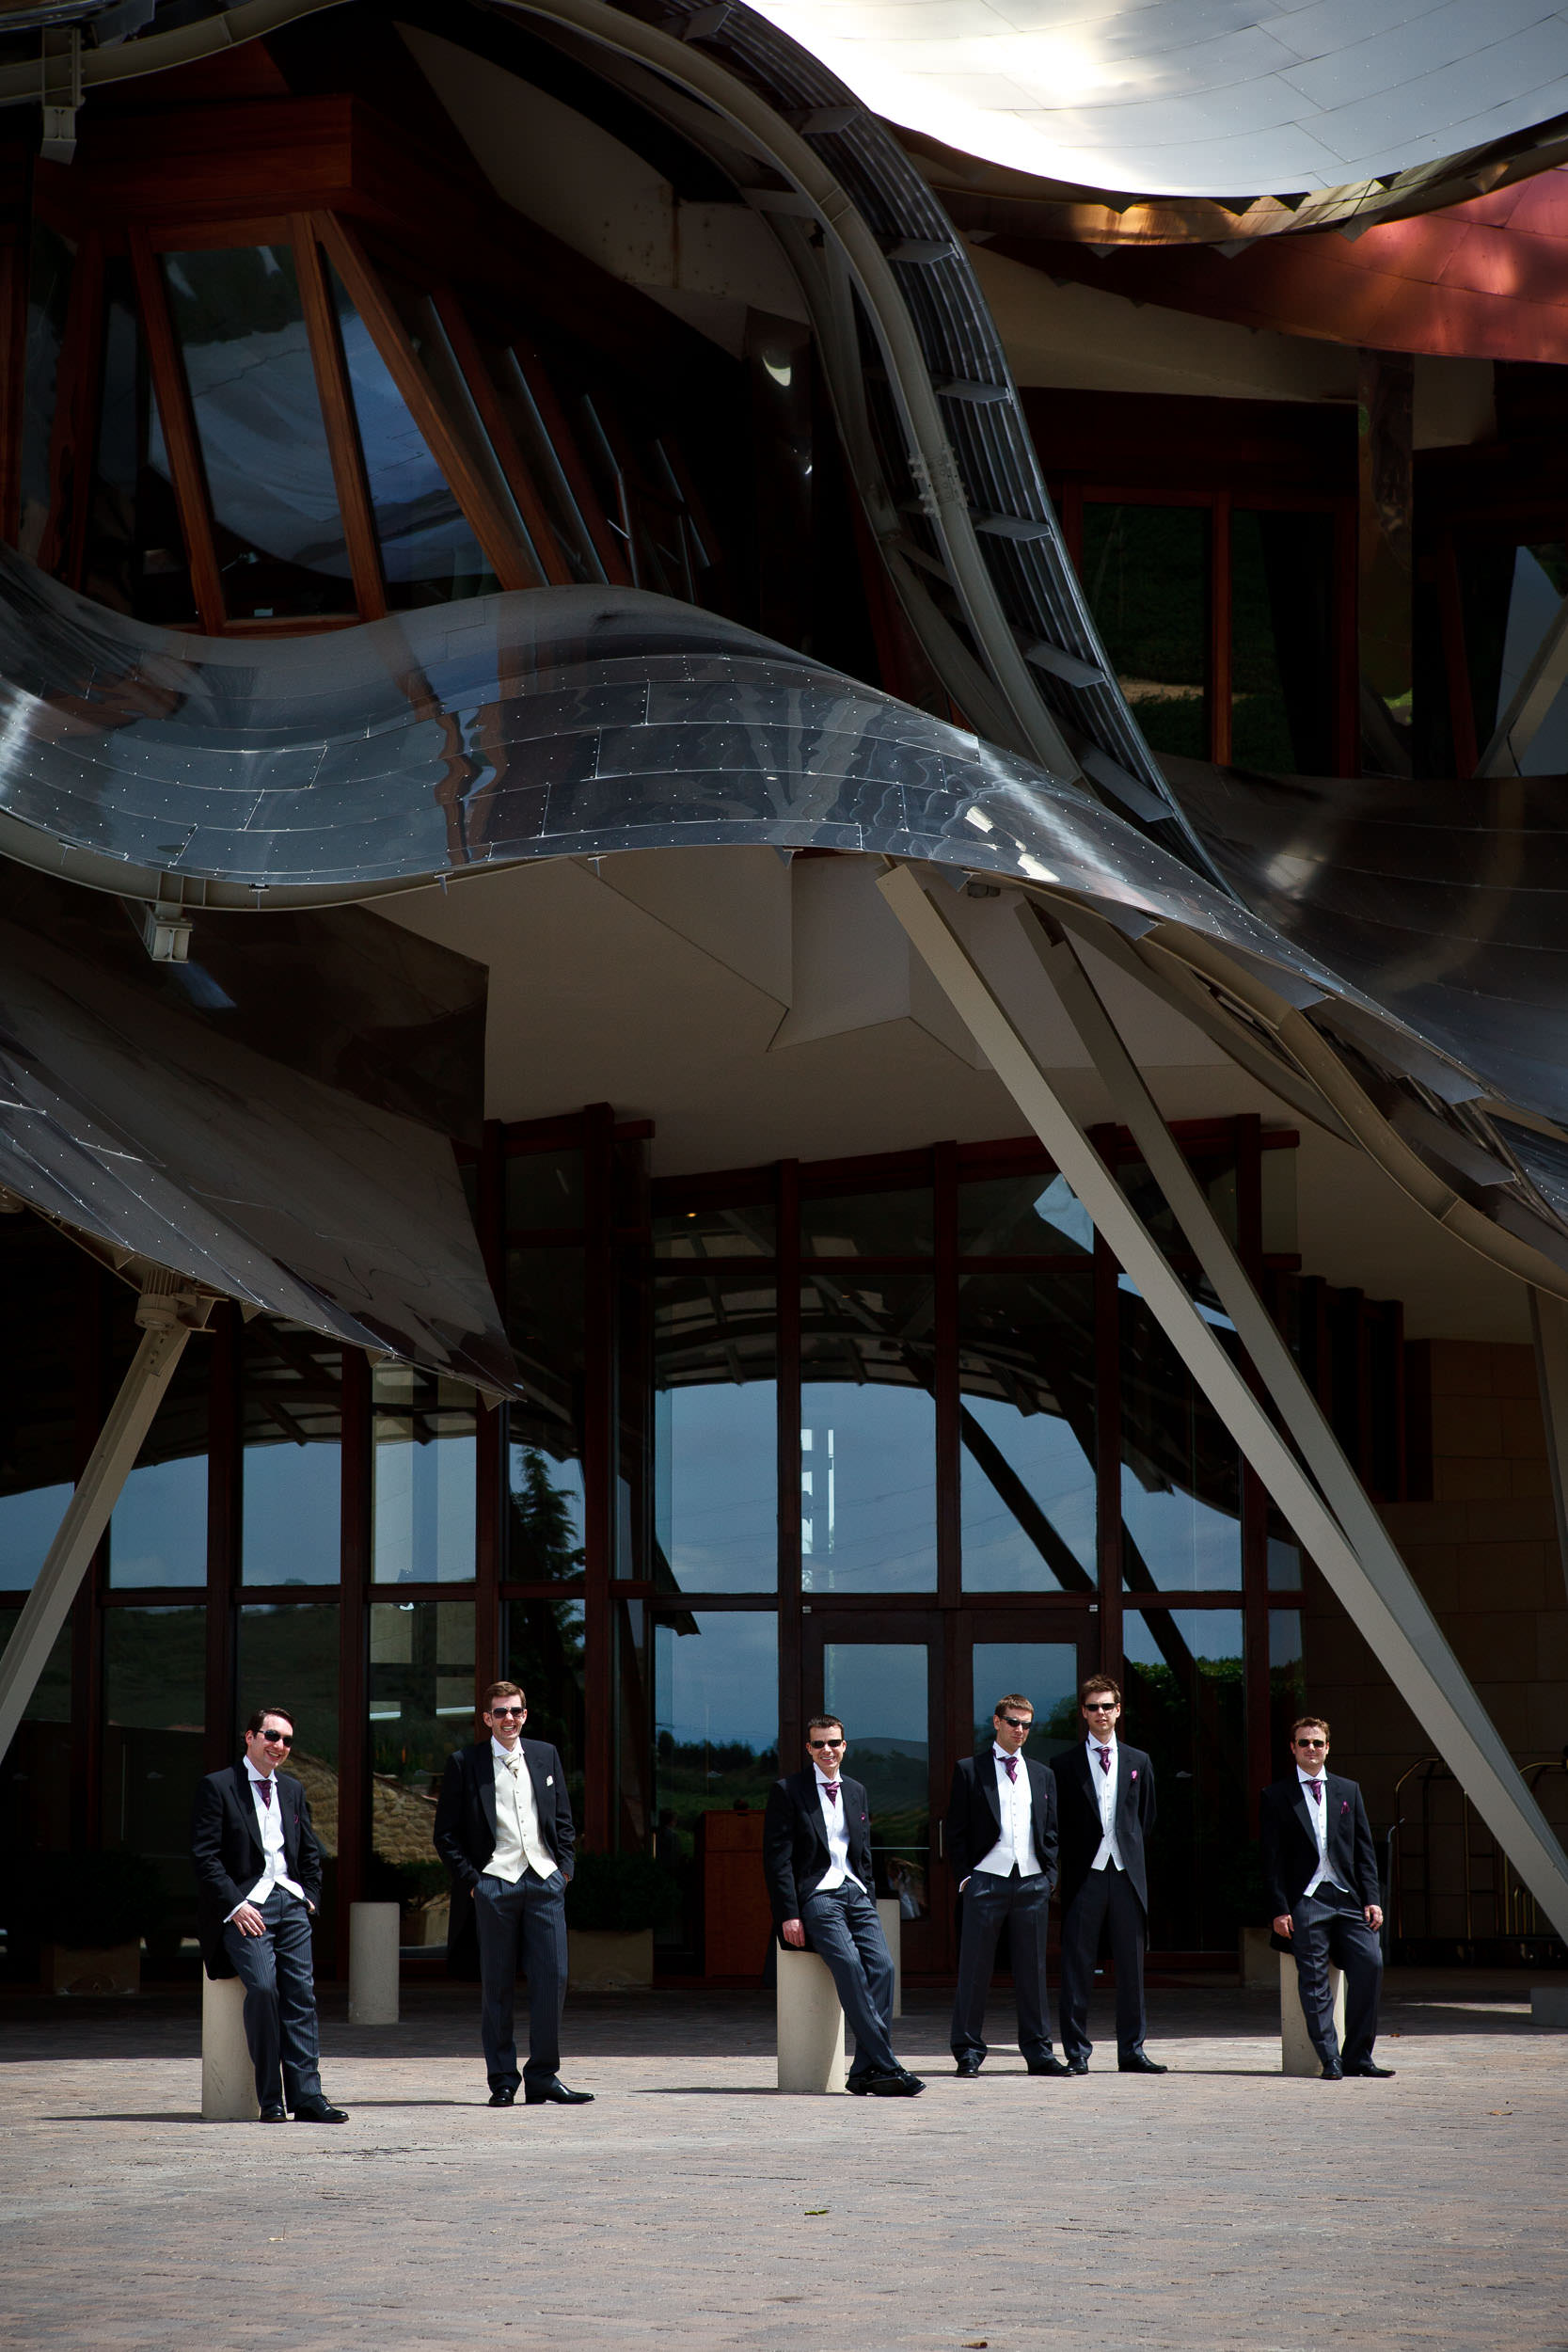 Wedding Photographer La Rioja Basque Country Spain - James Sturcke - sturcke.org_009.jpg